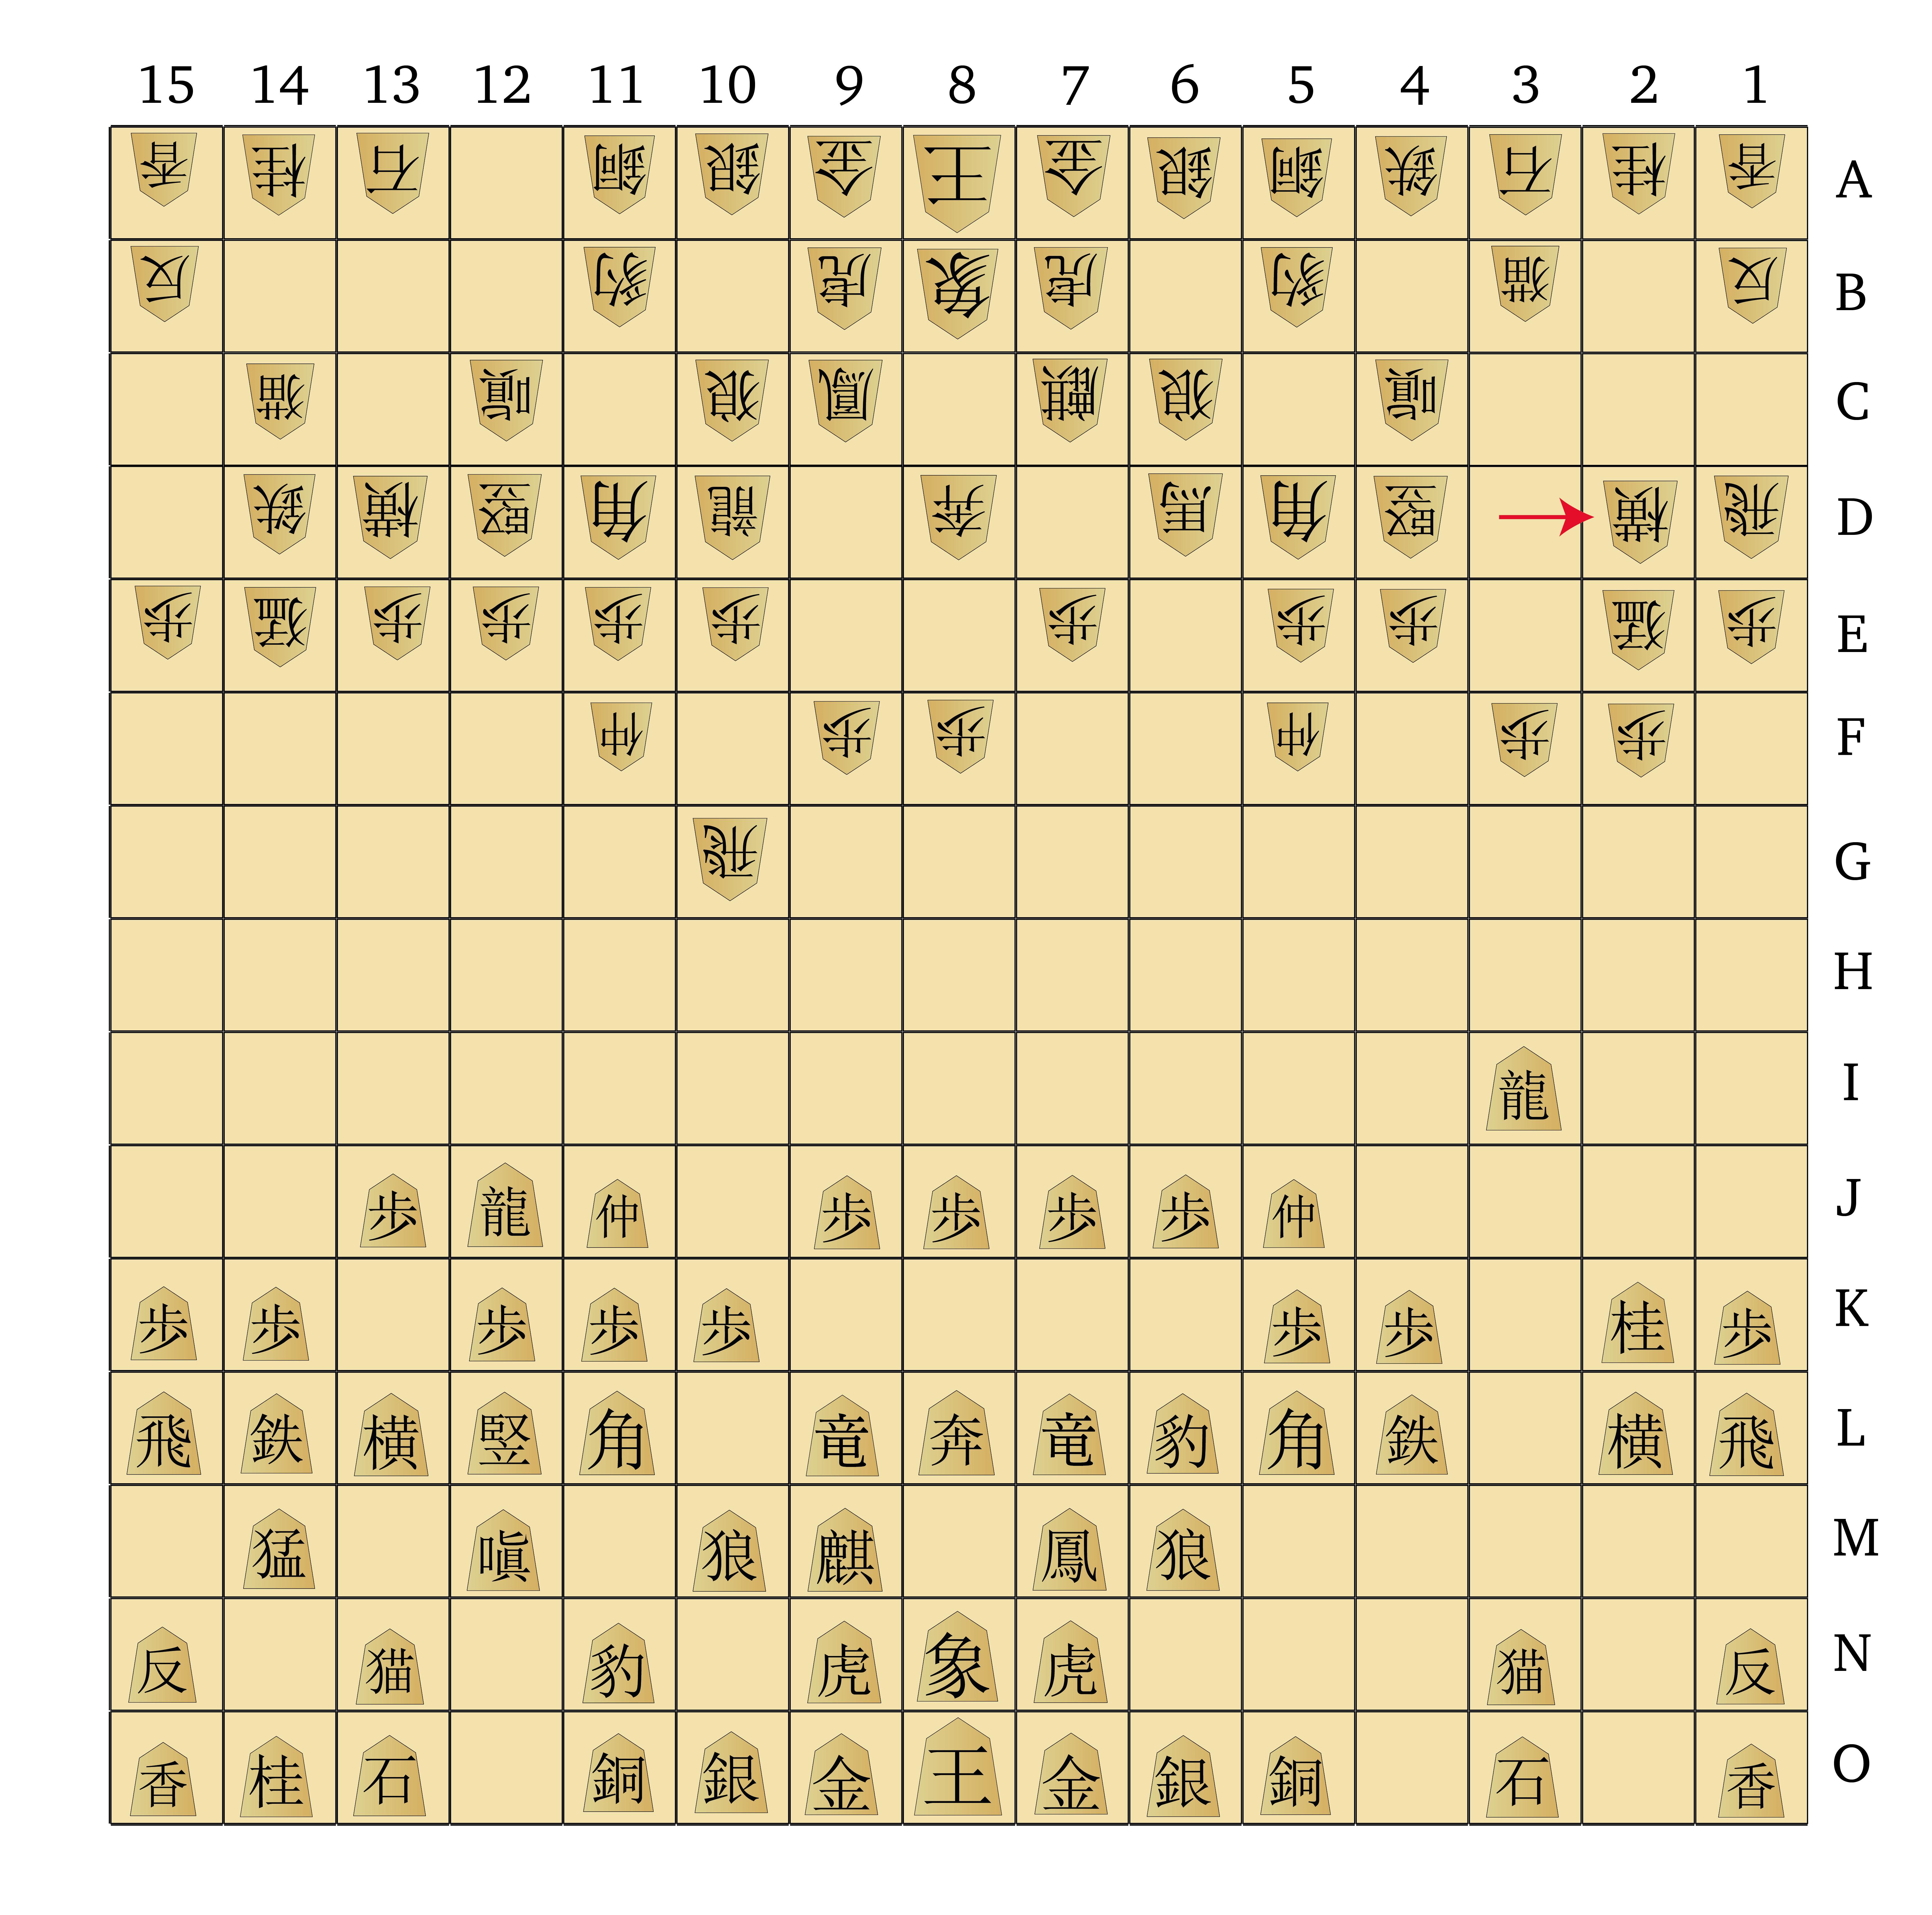 Dai Shogi 420 -- Move 80-01